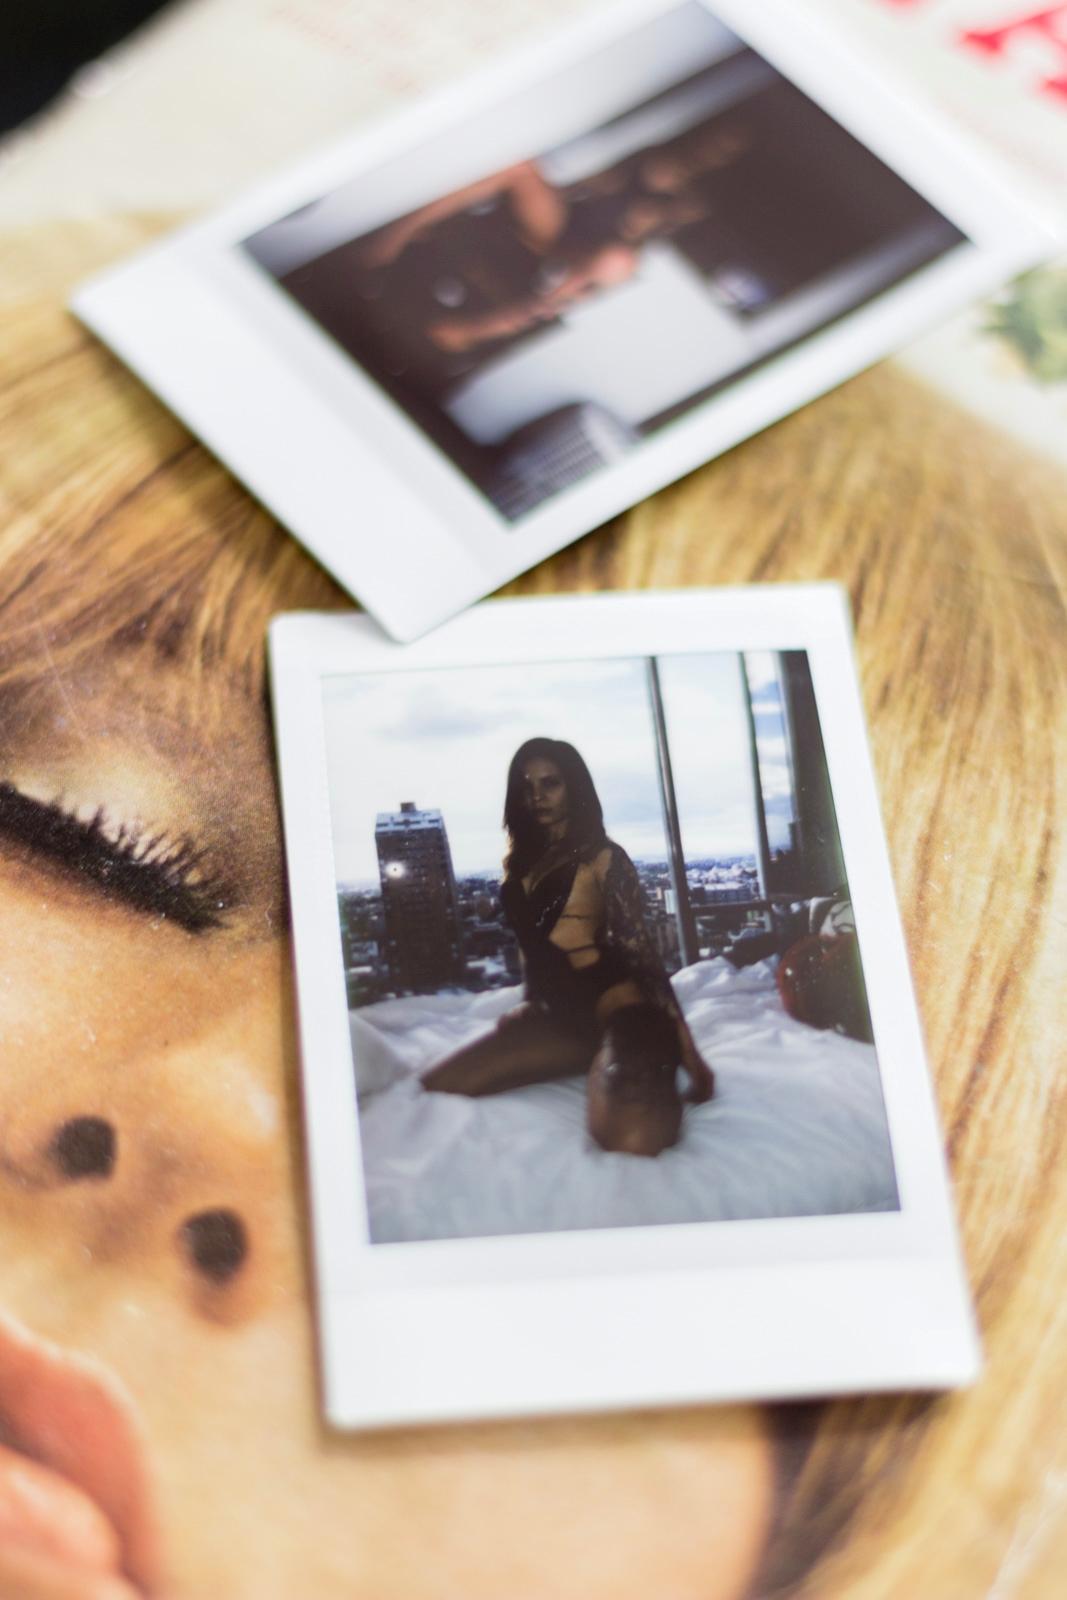 Katy - Bogota, Colombia, Fashion - gusperdomo | ello